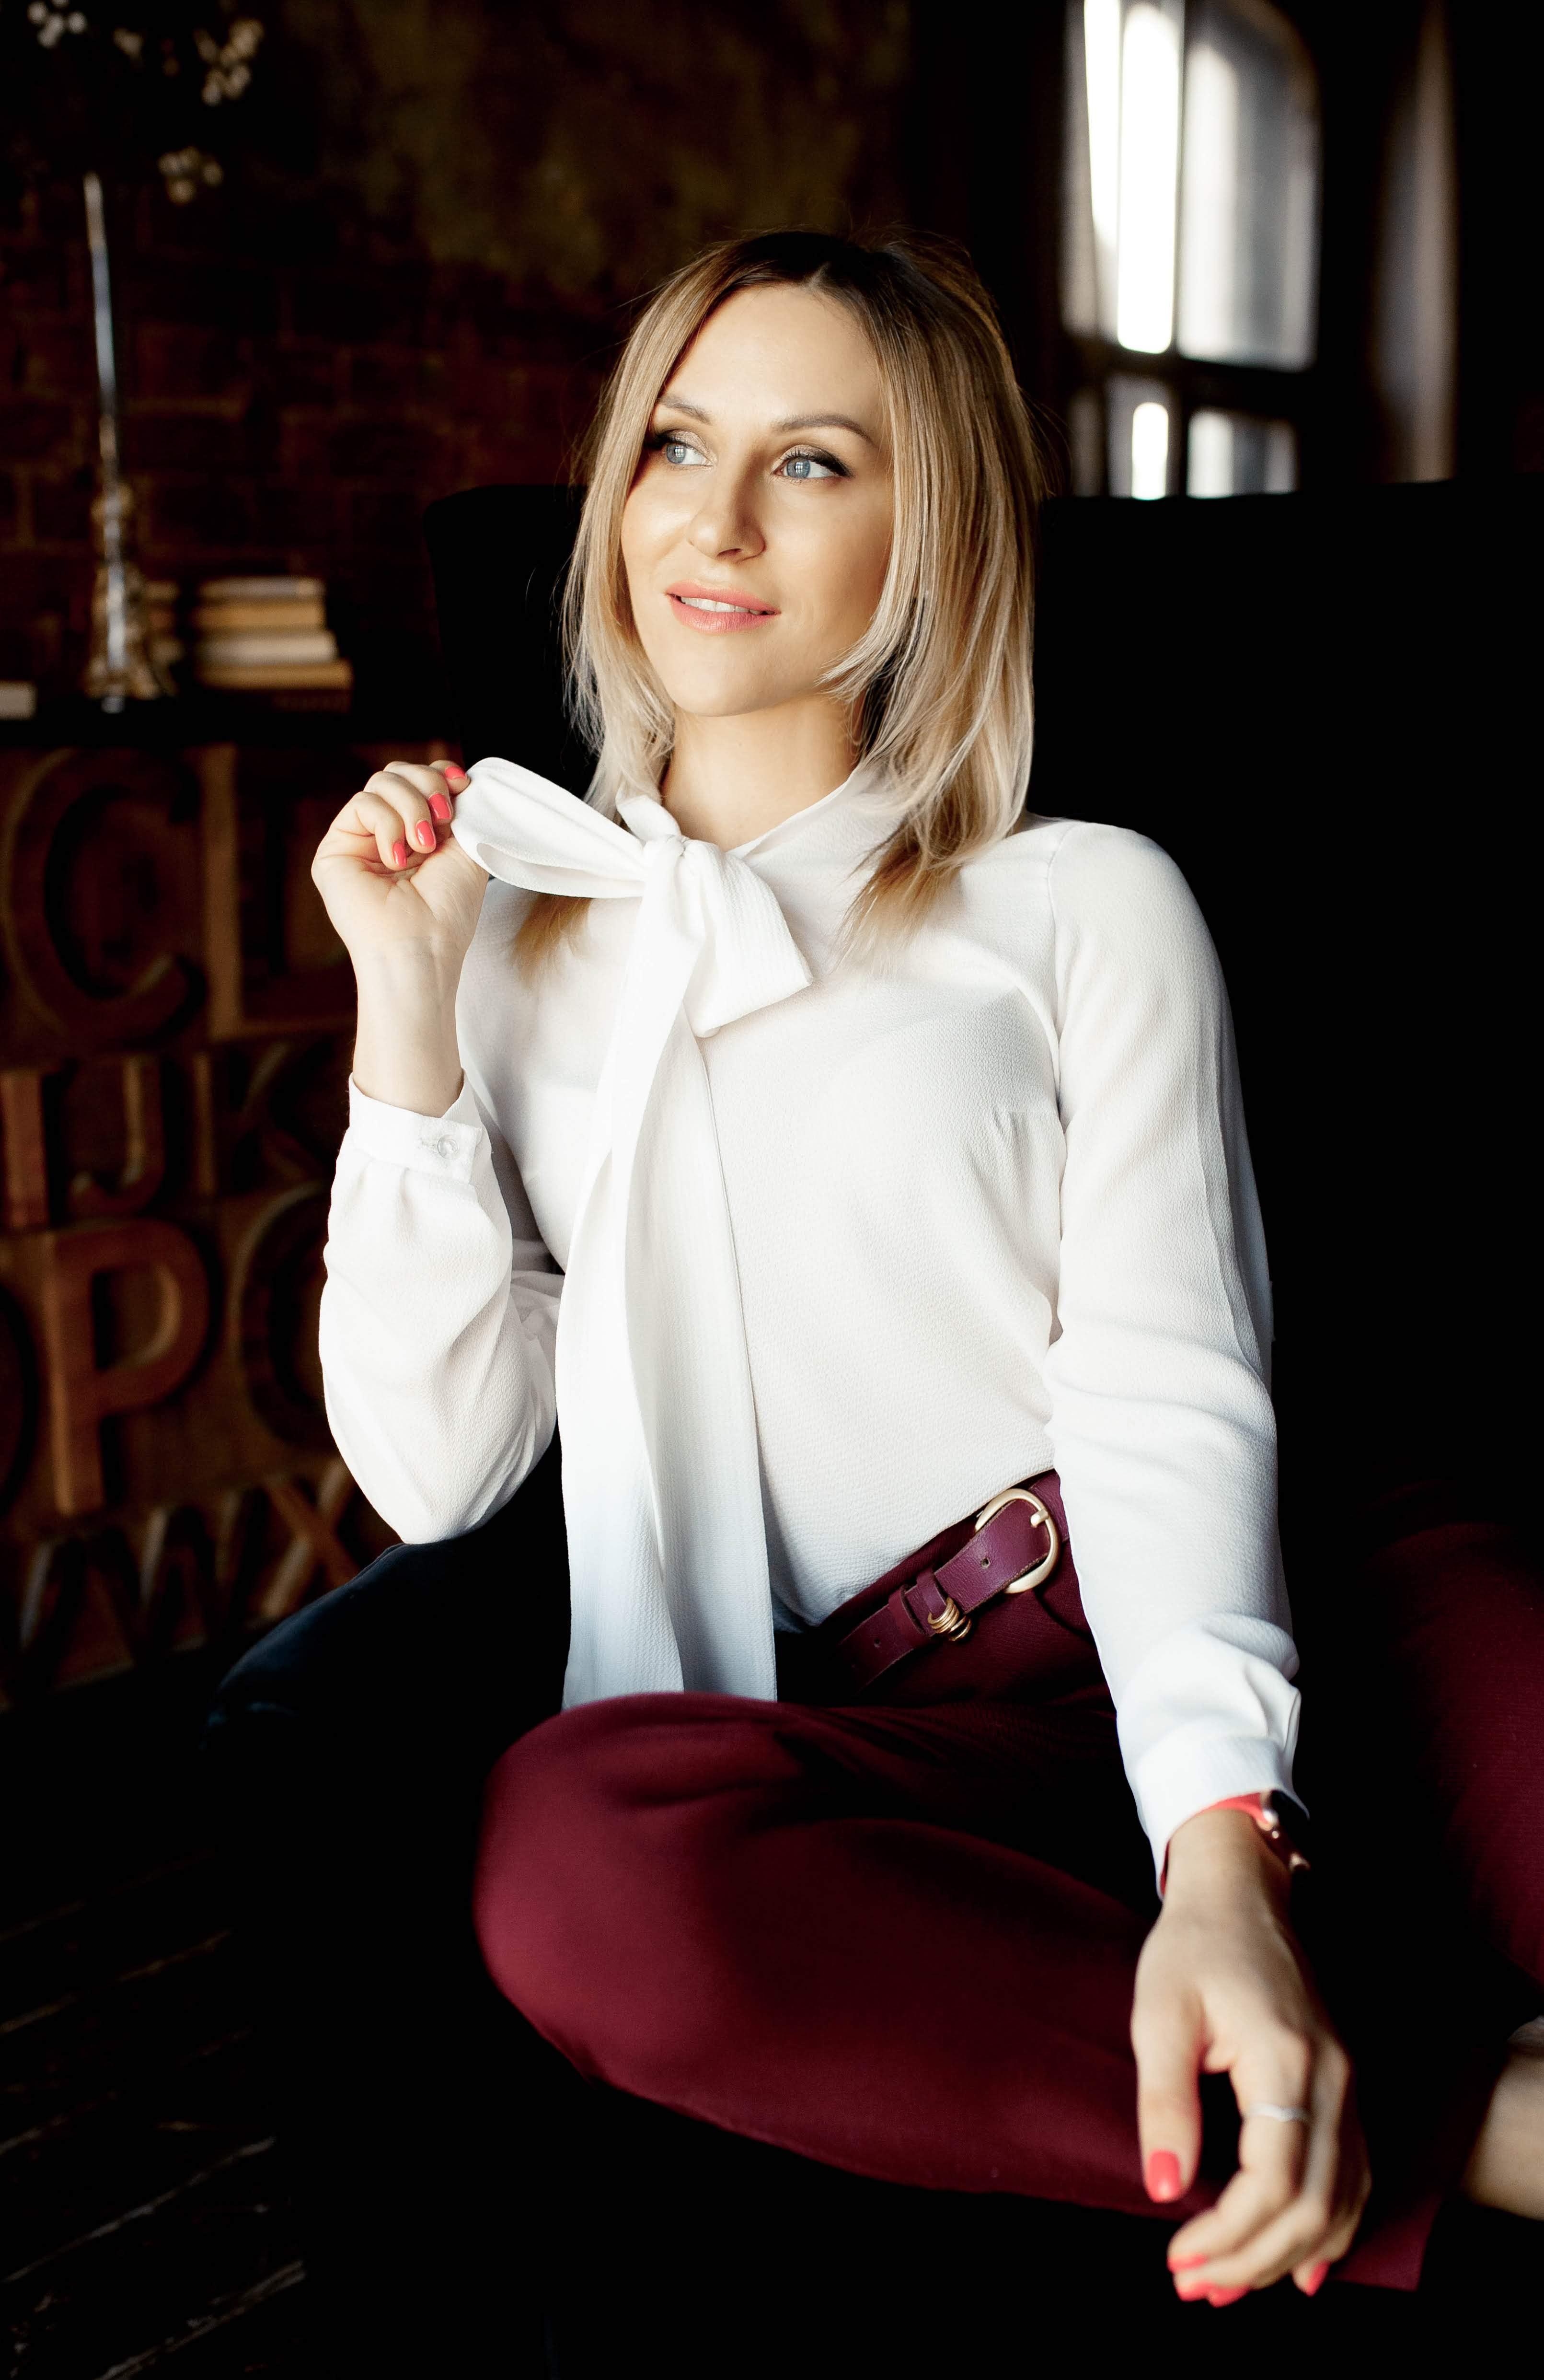 Agence matrimoniale rencontre de Maria  femme célibataire de 34 ans, Schiltigheim.